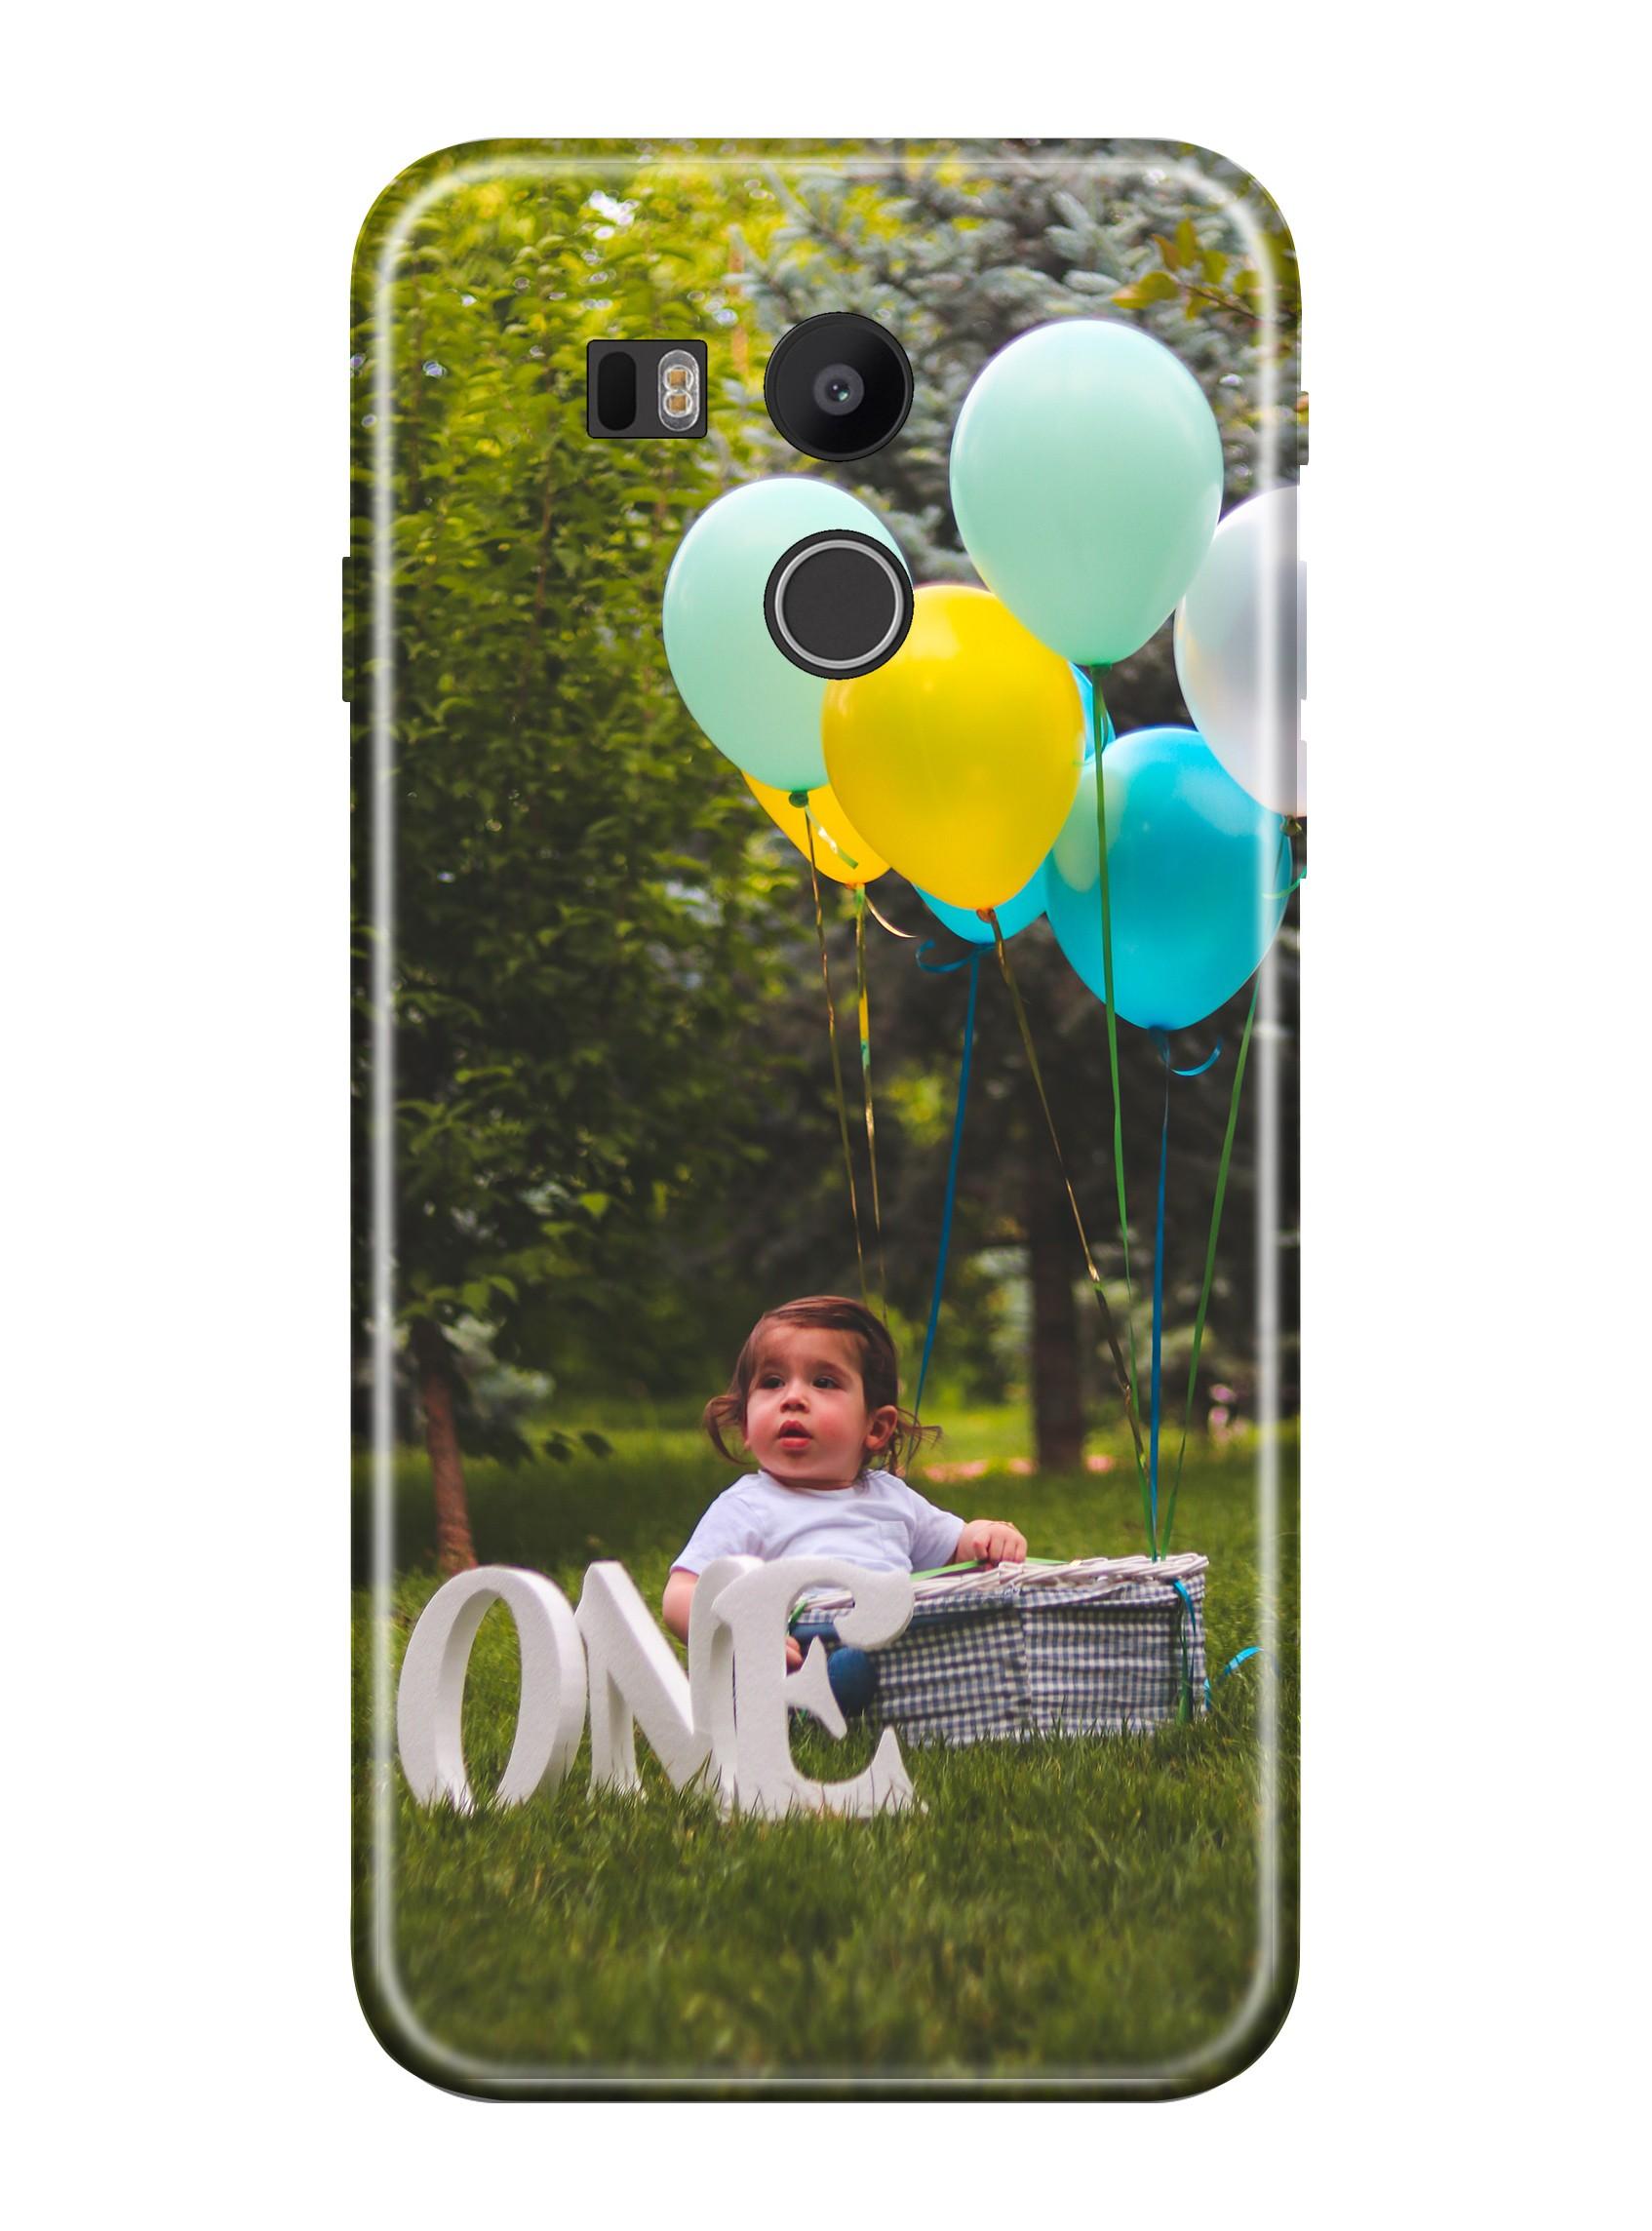 Personalised Case for LG Nexus 5